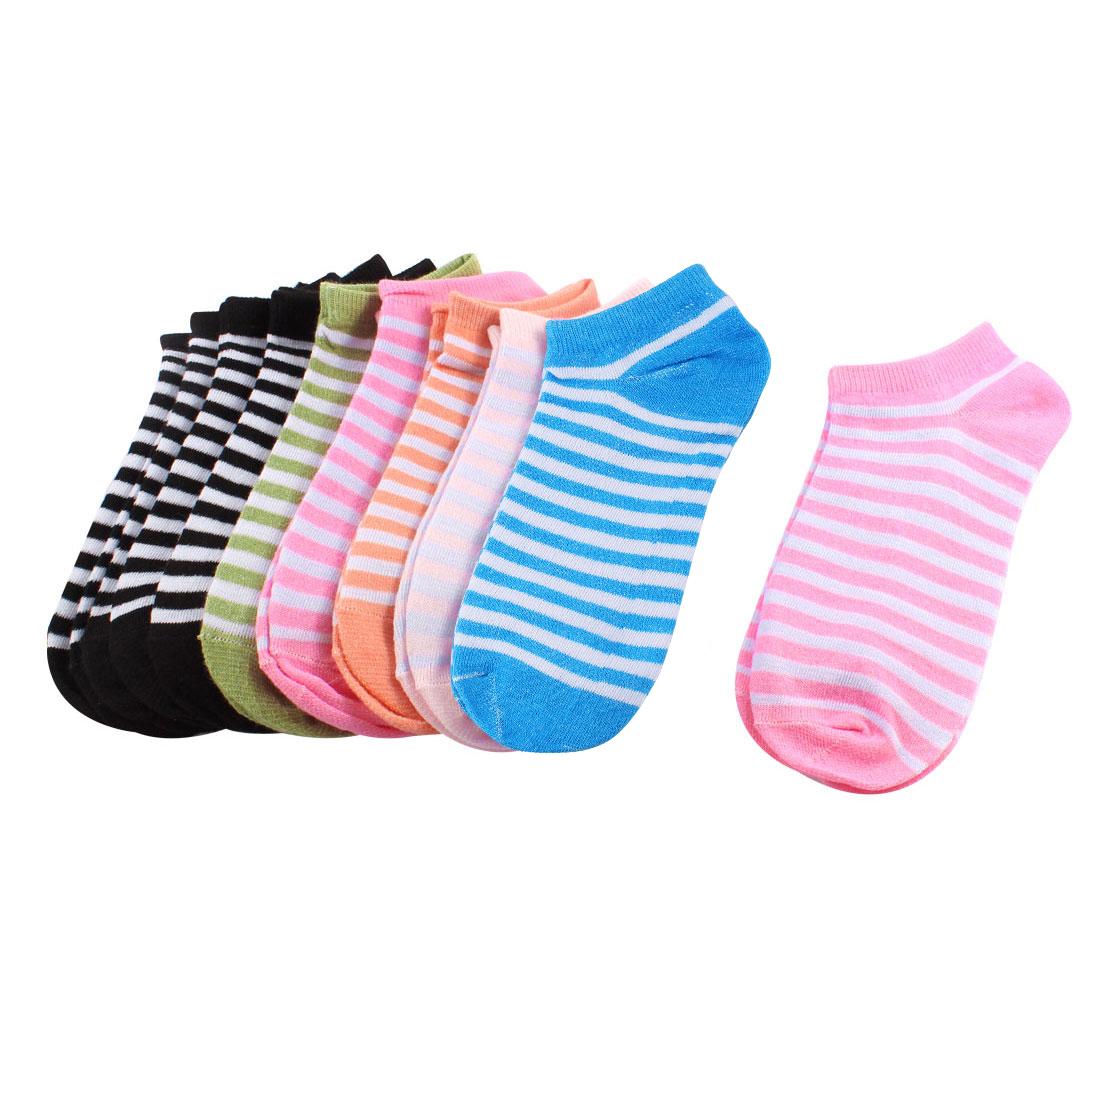 Girls Stripe Pattern Elastic Footsie Style Low Ankle Boat Socks MultiColor 10 Pairs